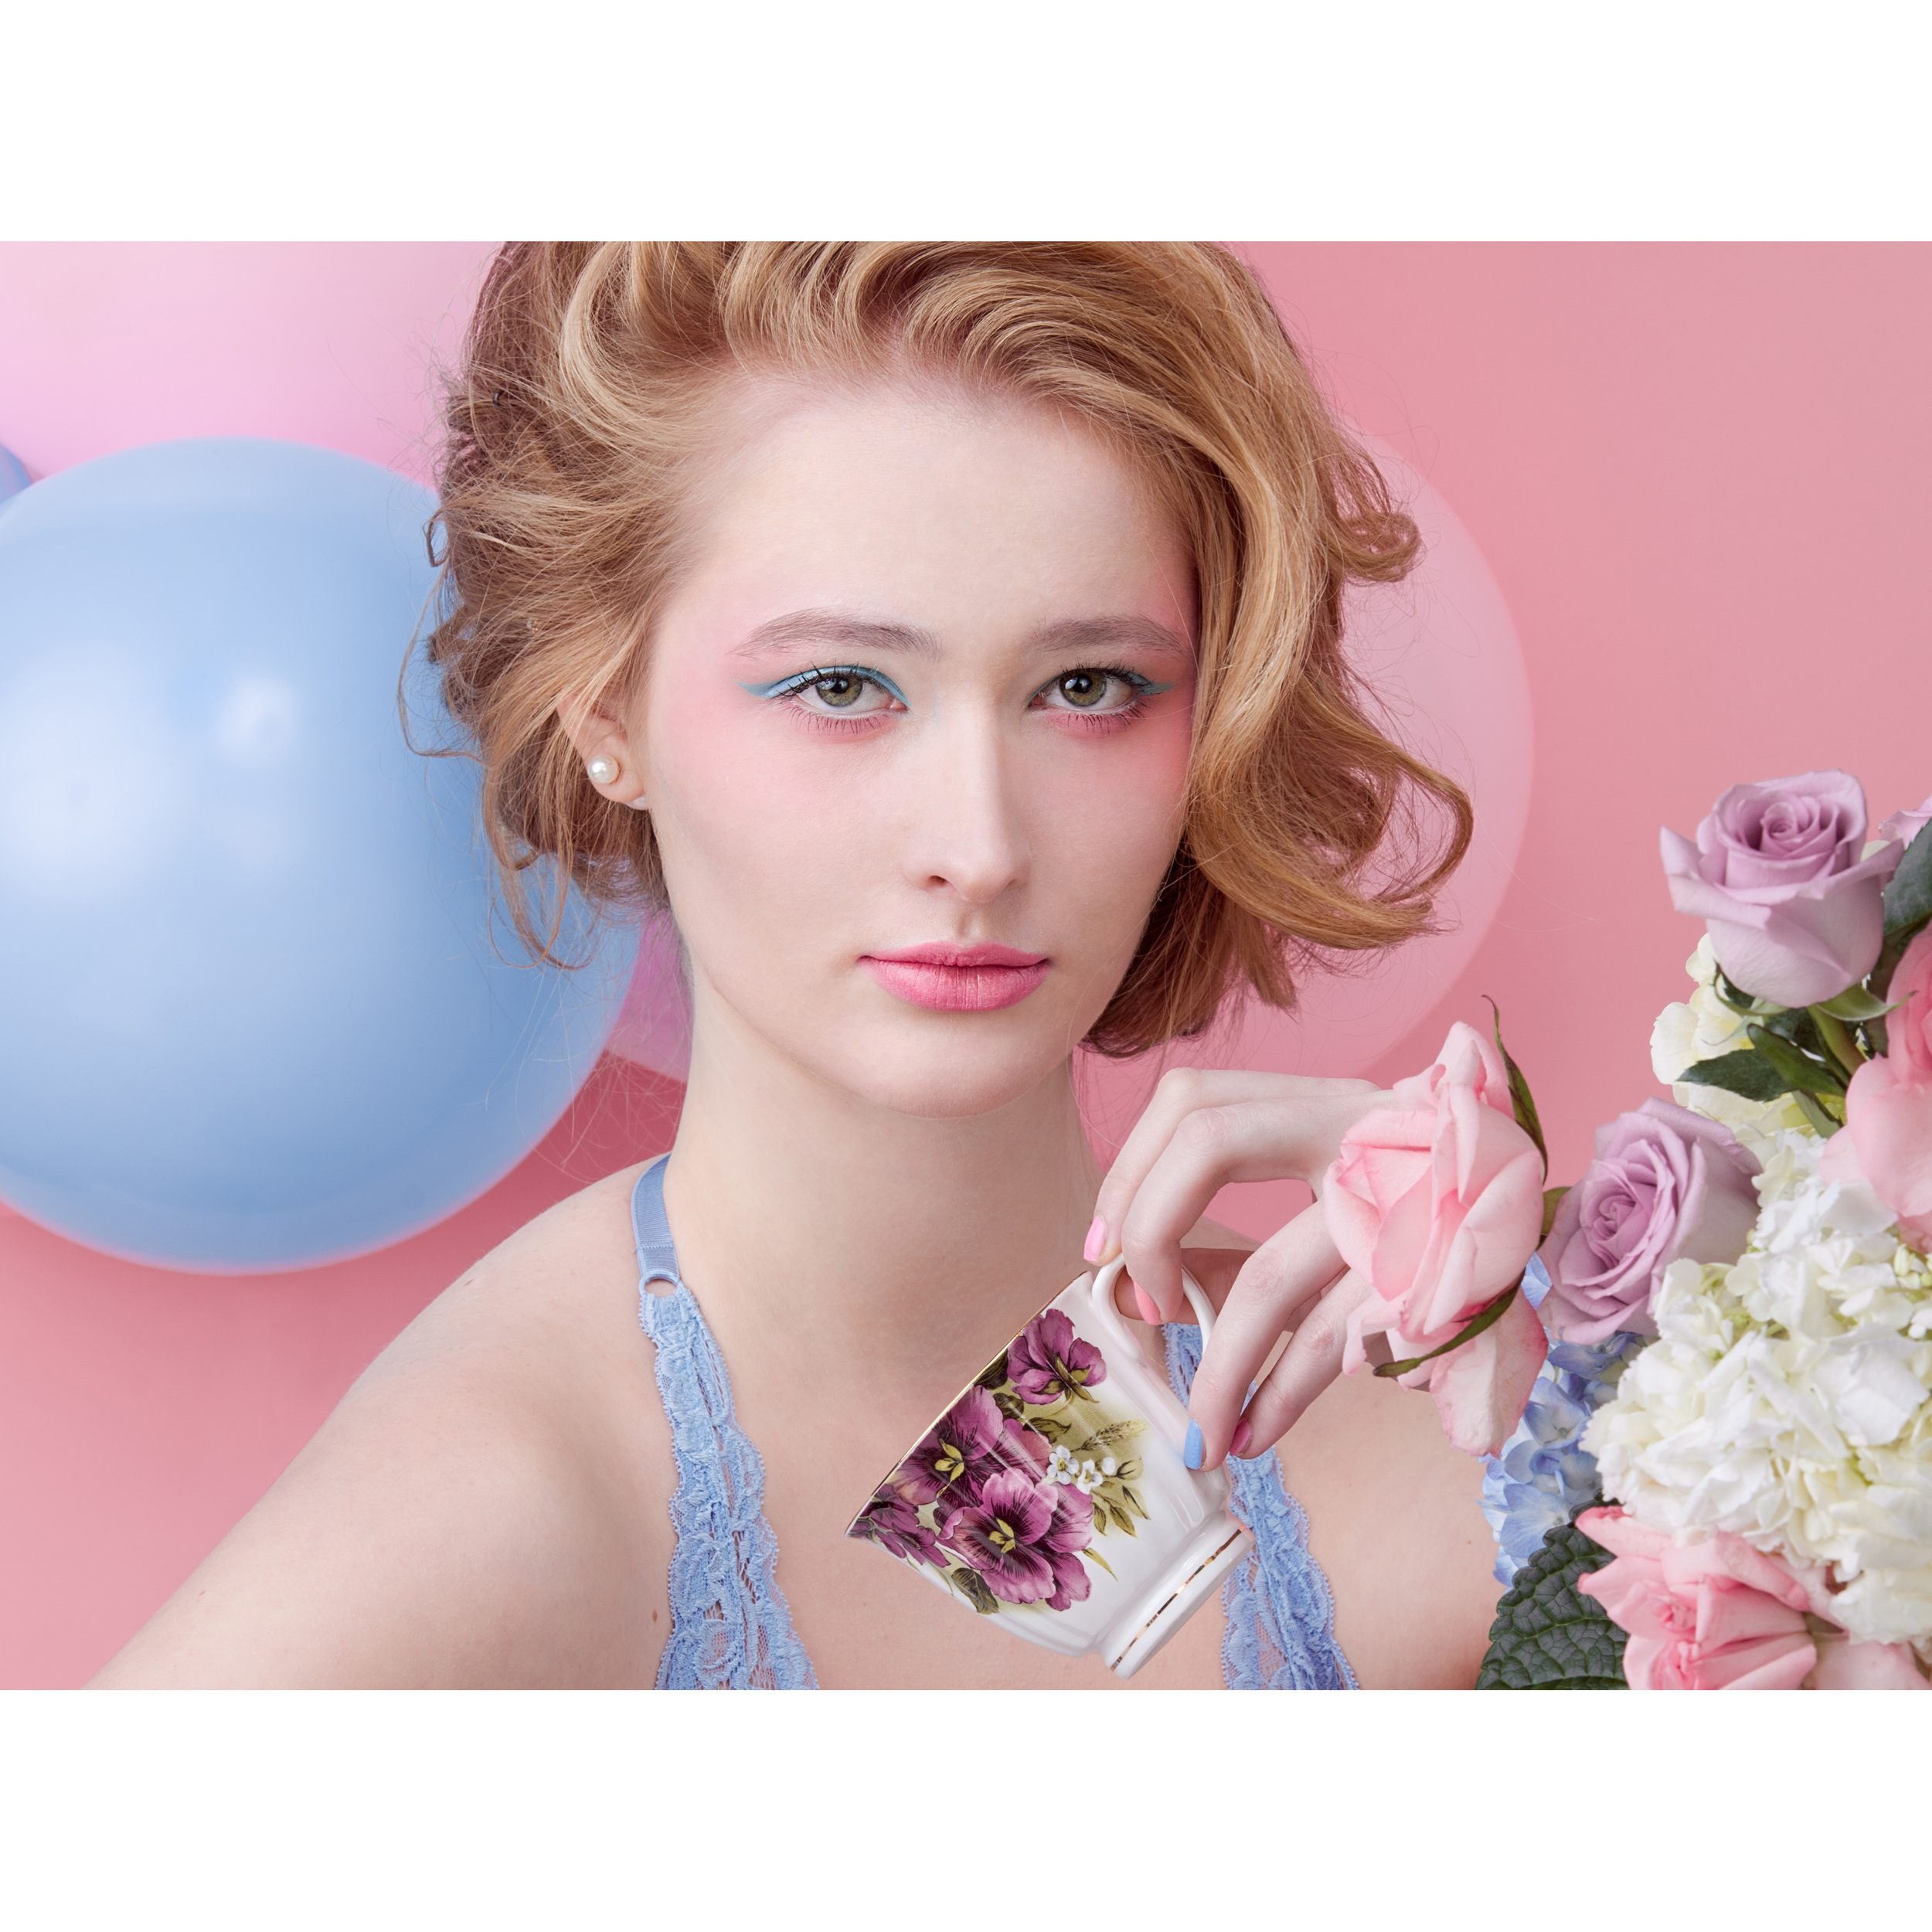 Candy Dream-C151220 Maria-2647-Edit copy.jpg